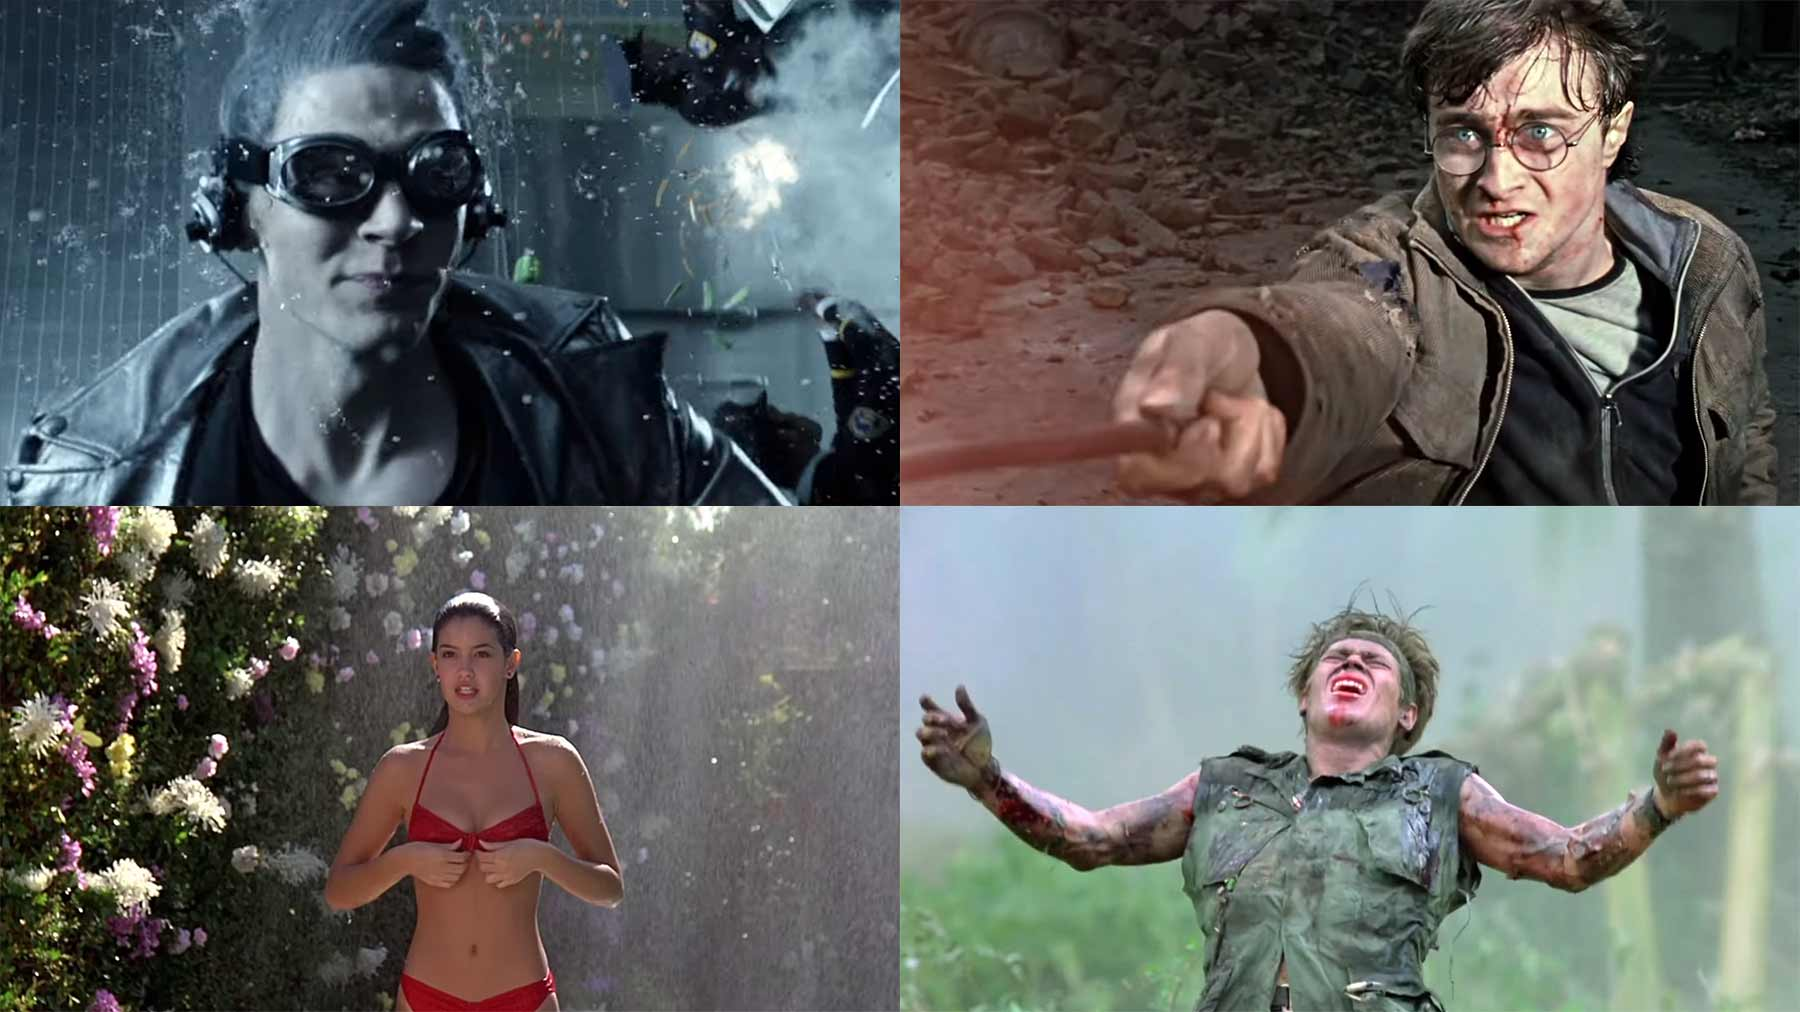 Supercut: Slowmotion-Szenen in Filmen